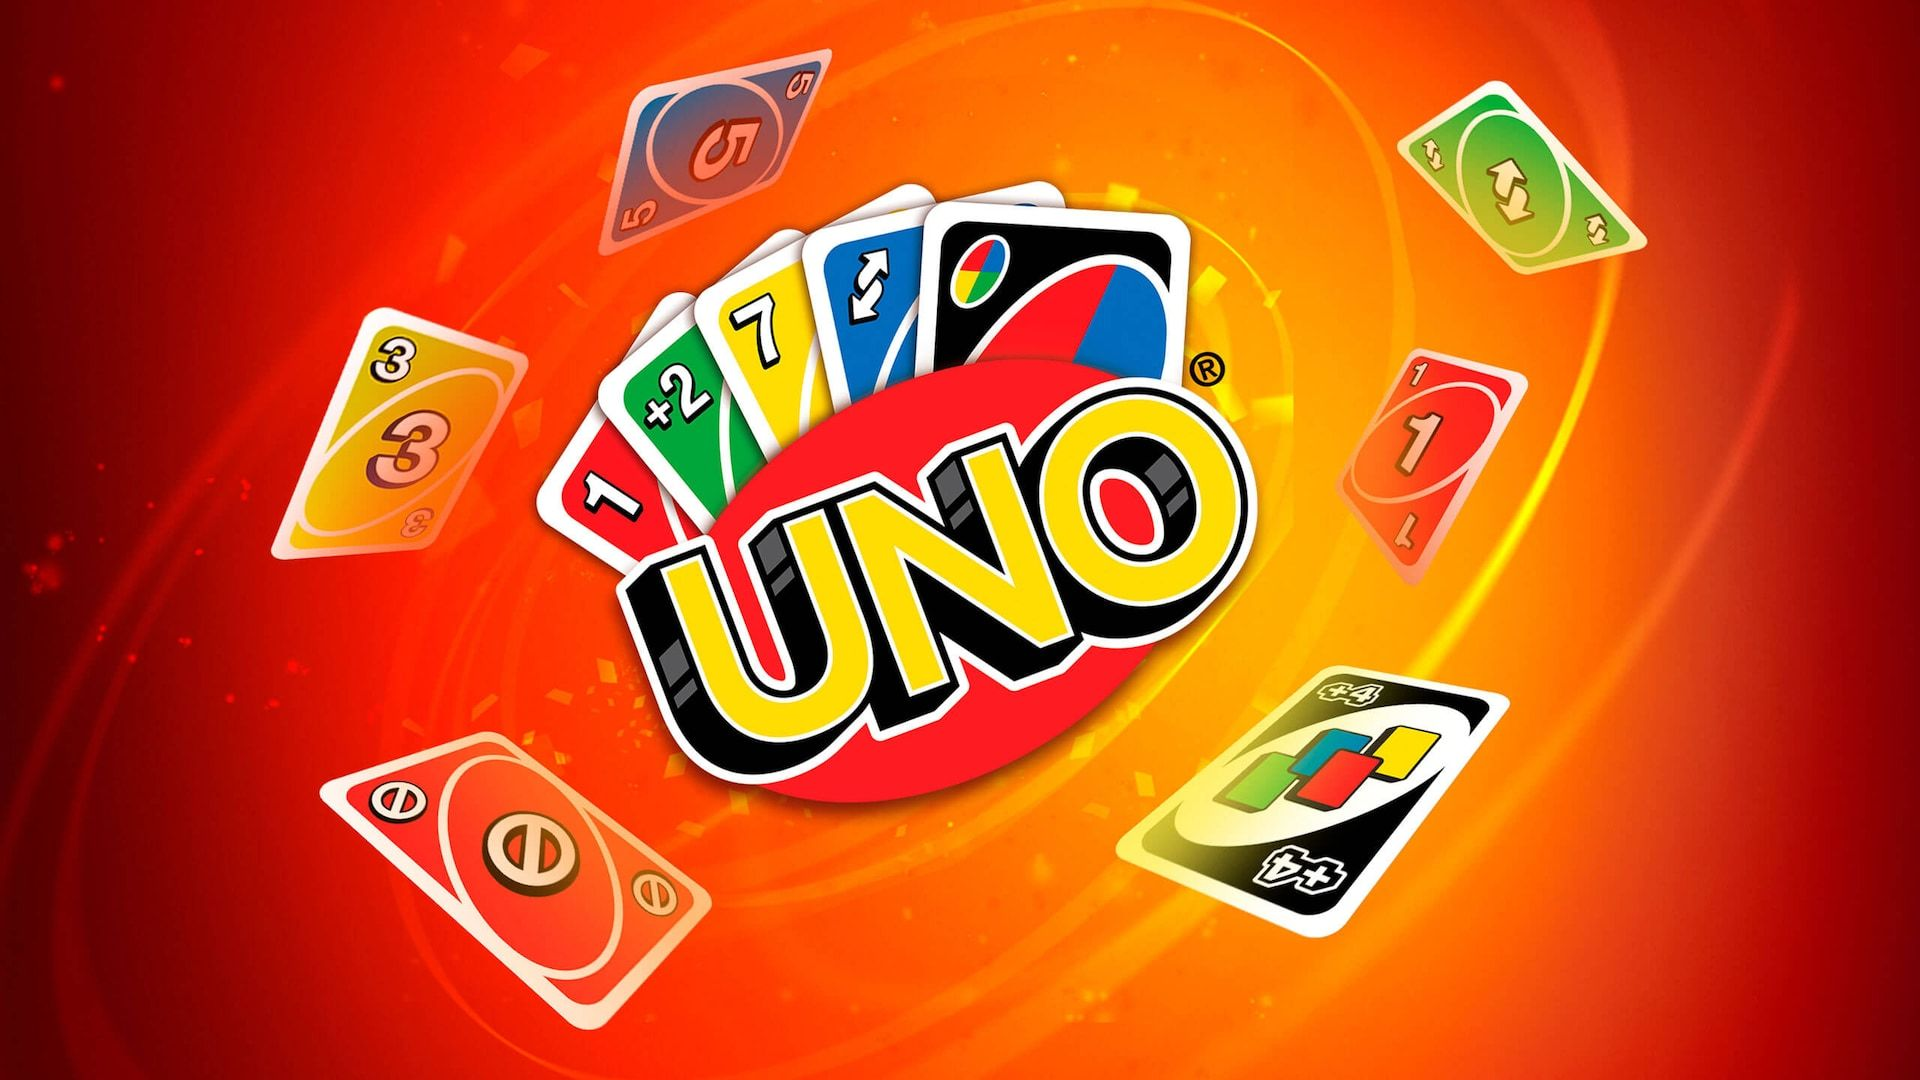 Uno Uno Game Store Strategy Card Games Favorite Board Games